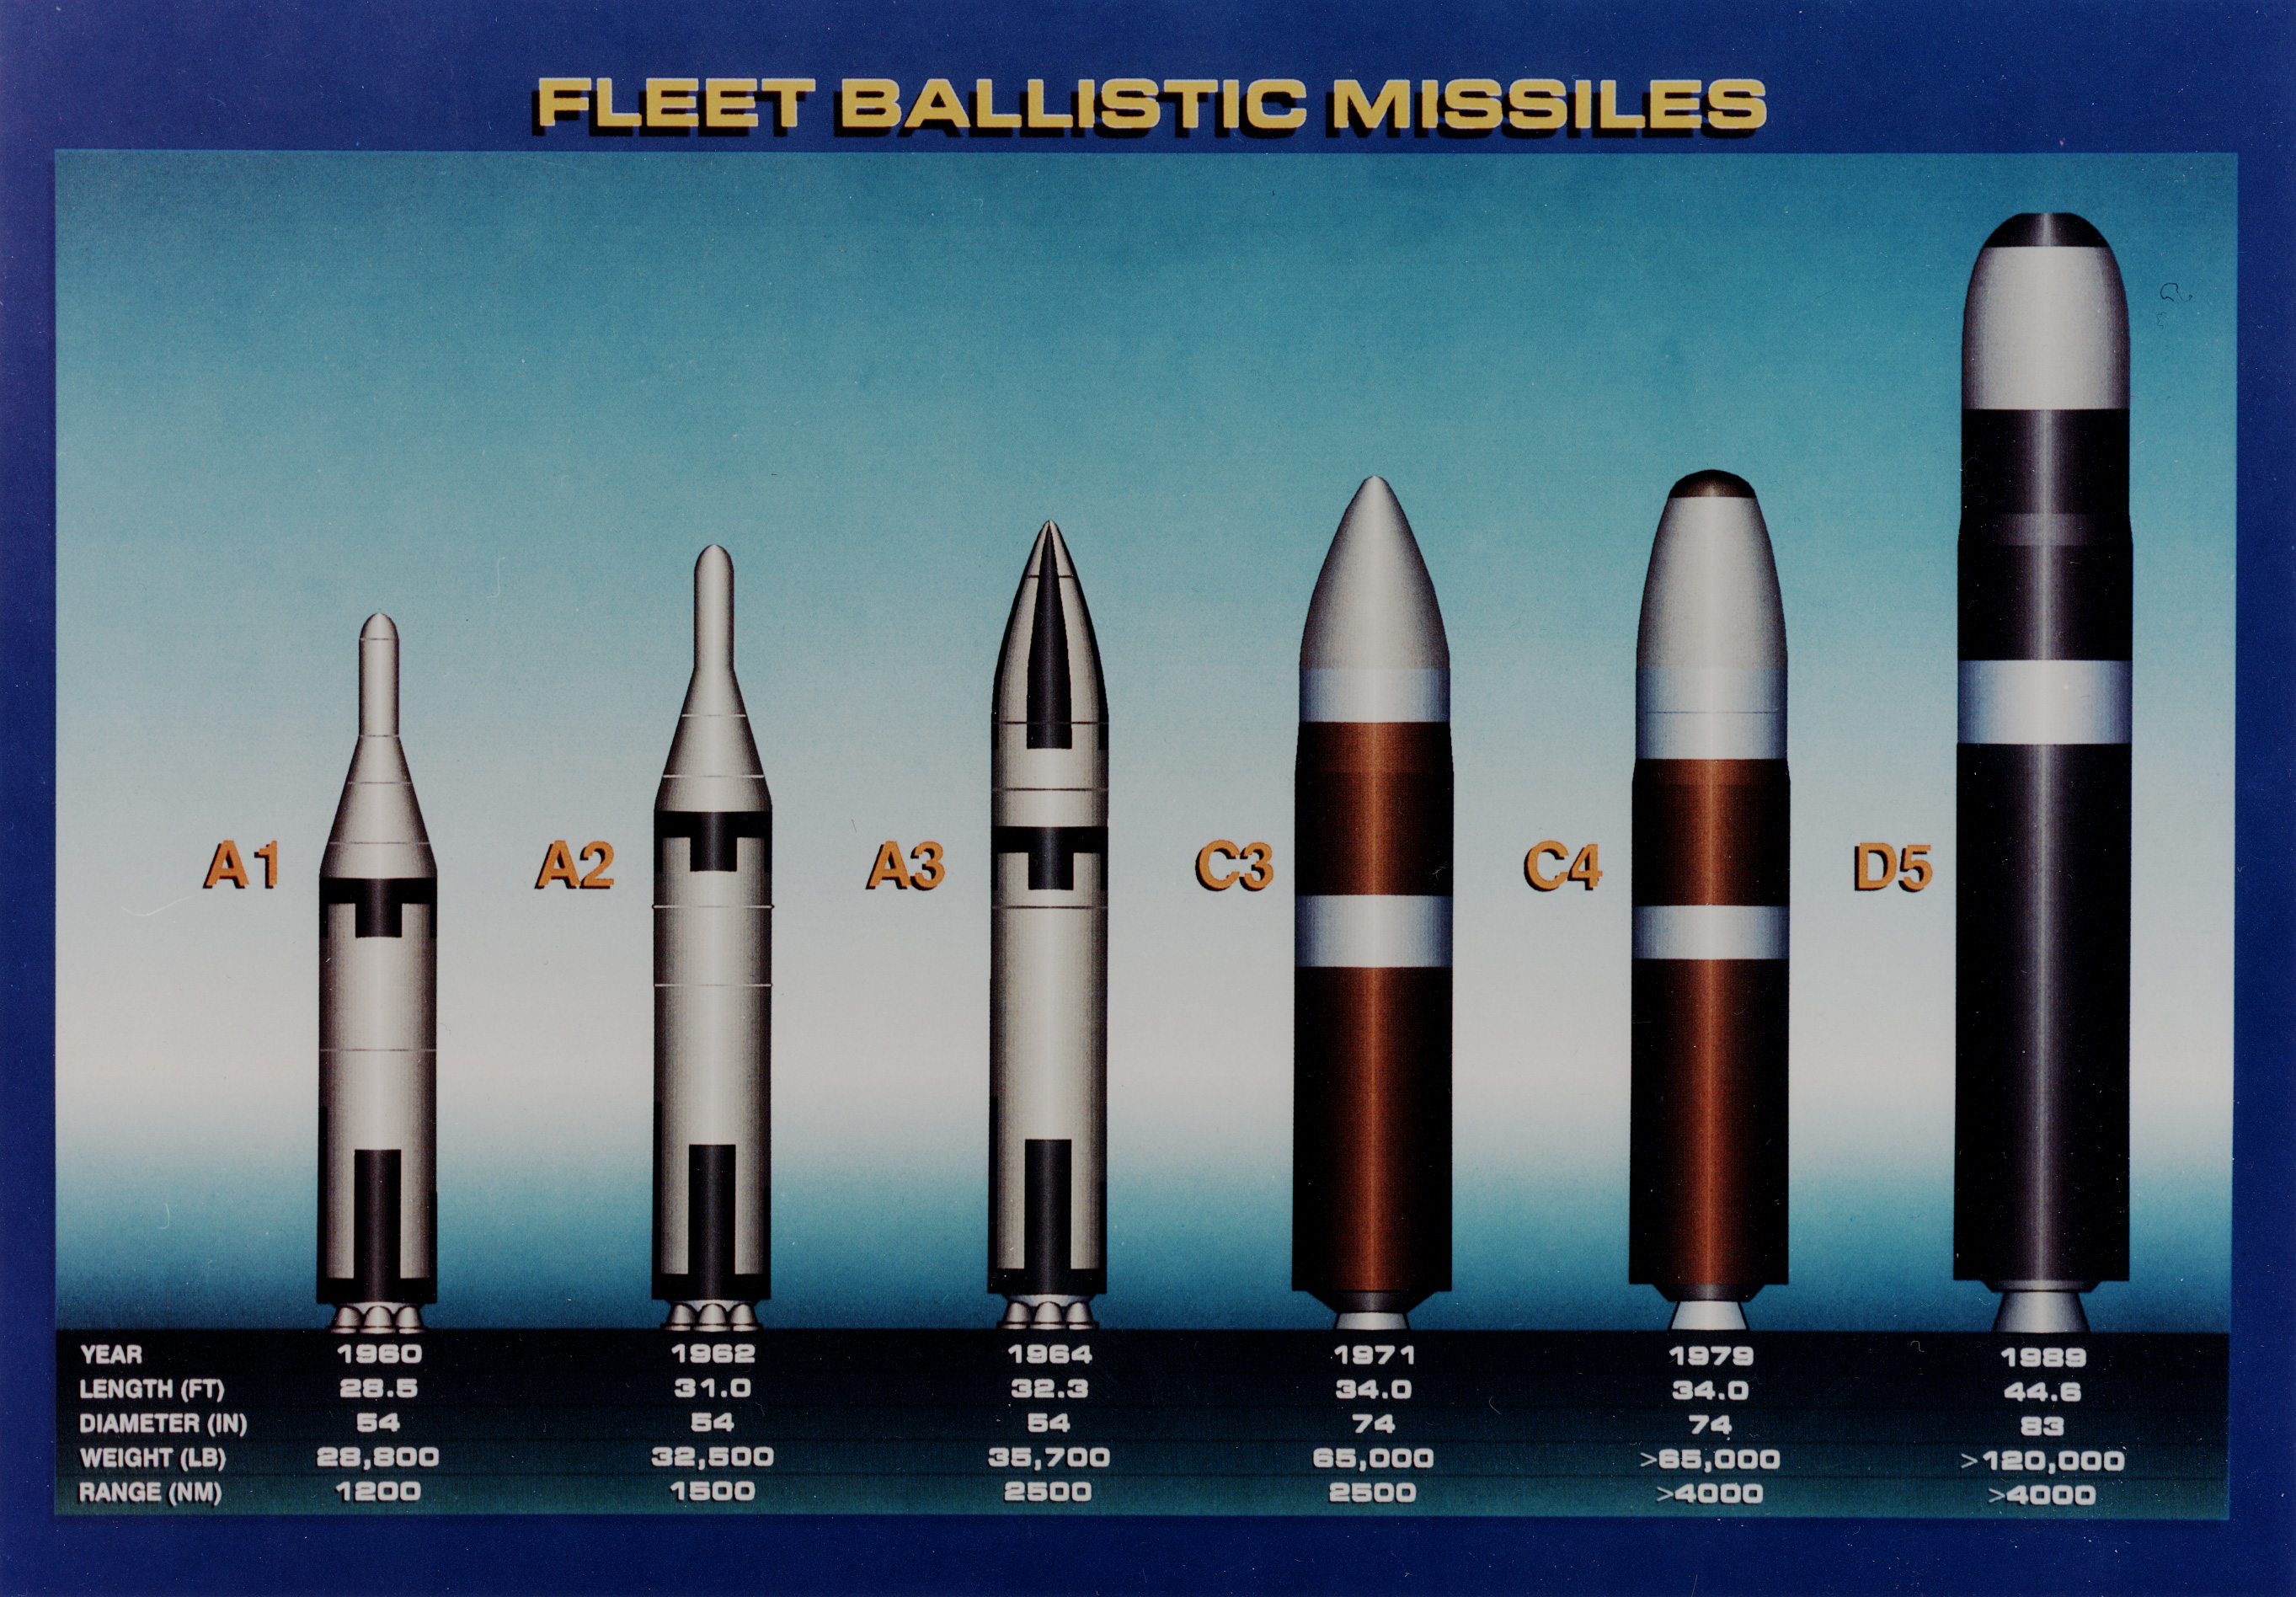 fleet ballistic missile logos